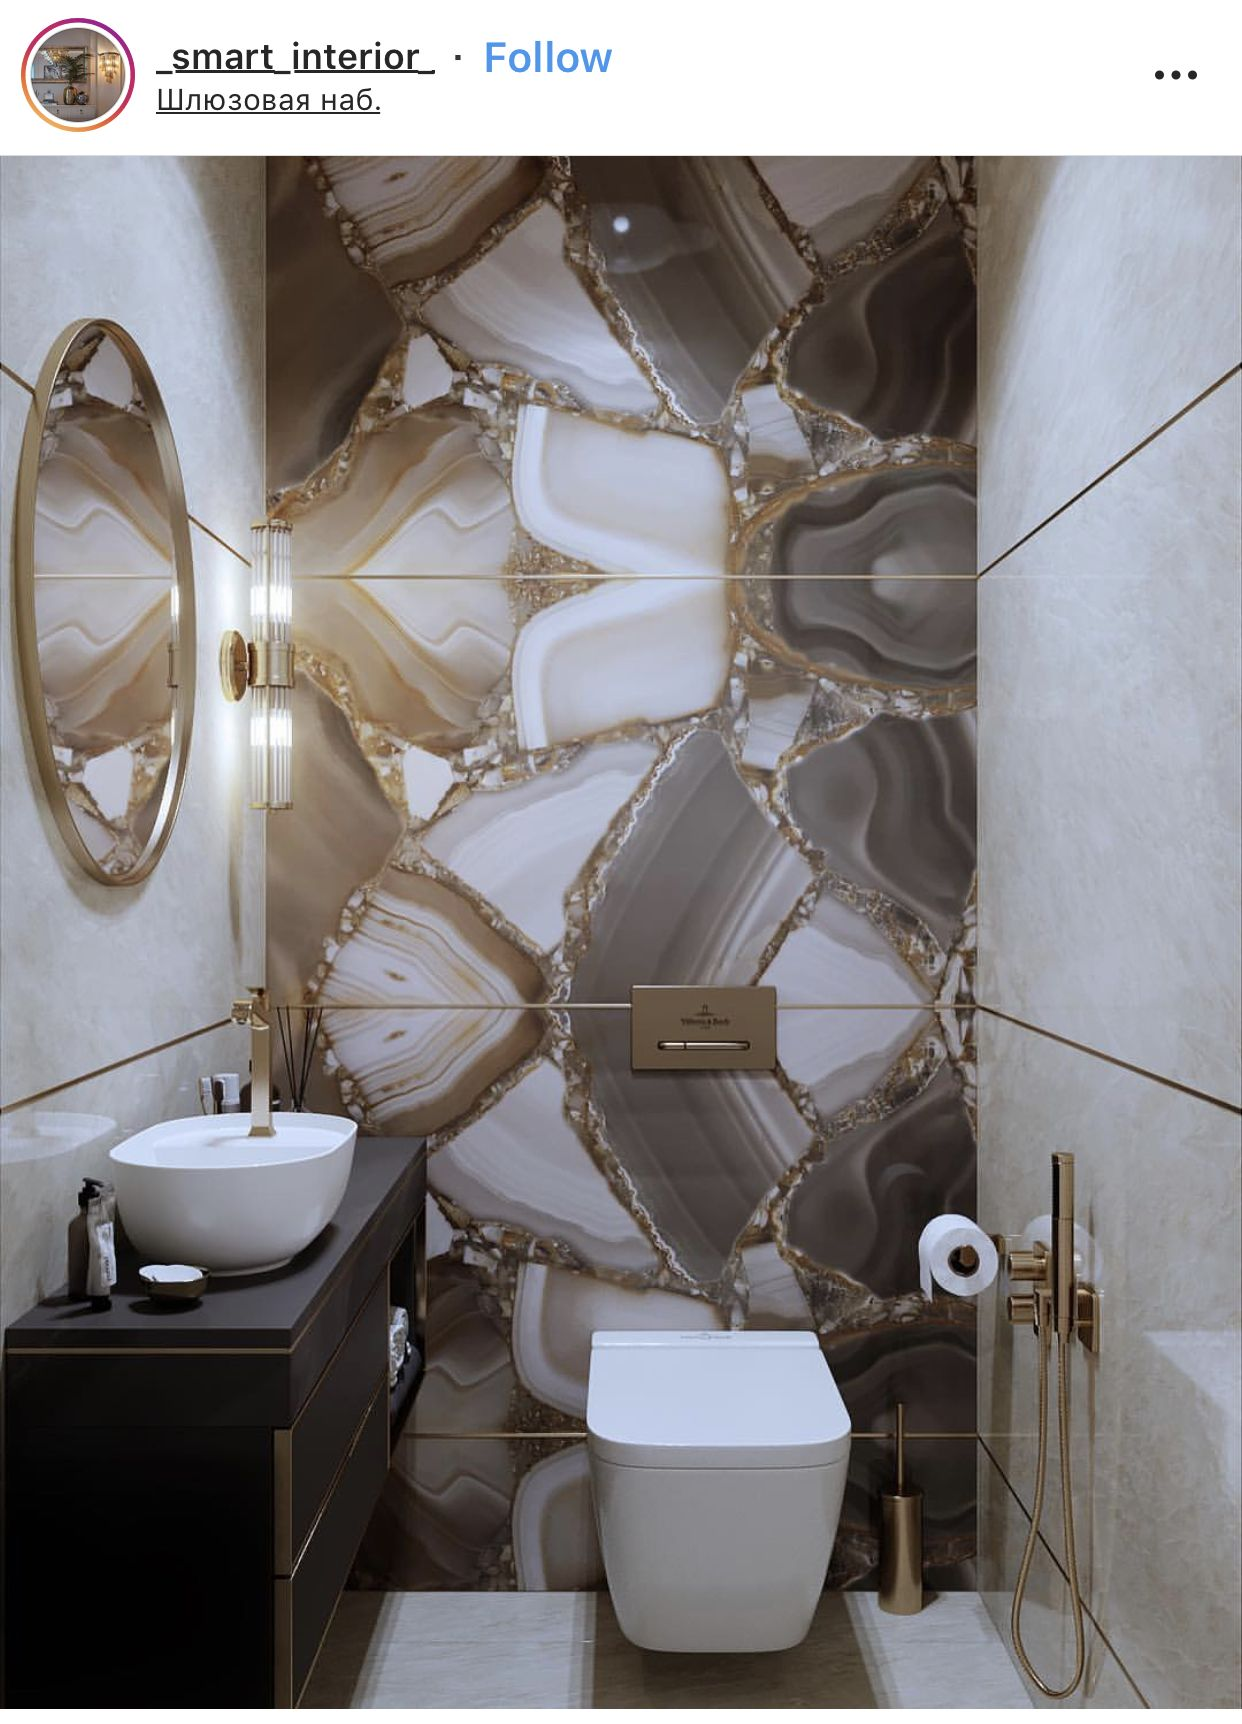 Pin By Samanzar Khan On Dhaka Home Bathroom Design Luxury